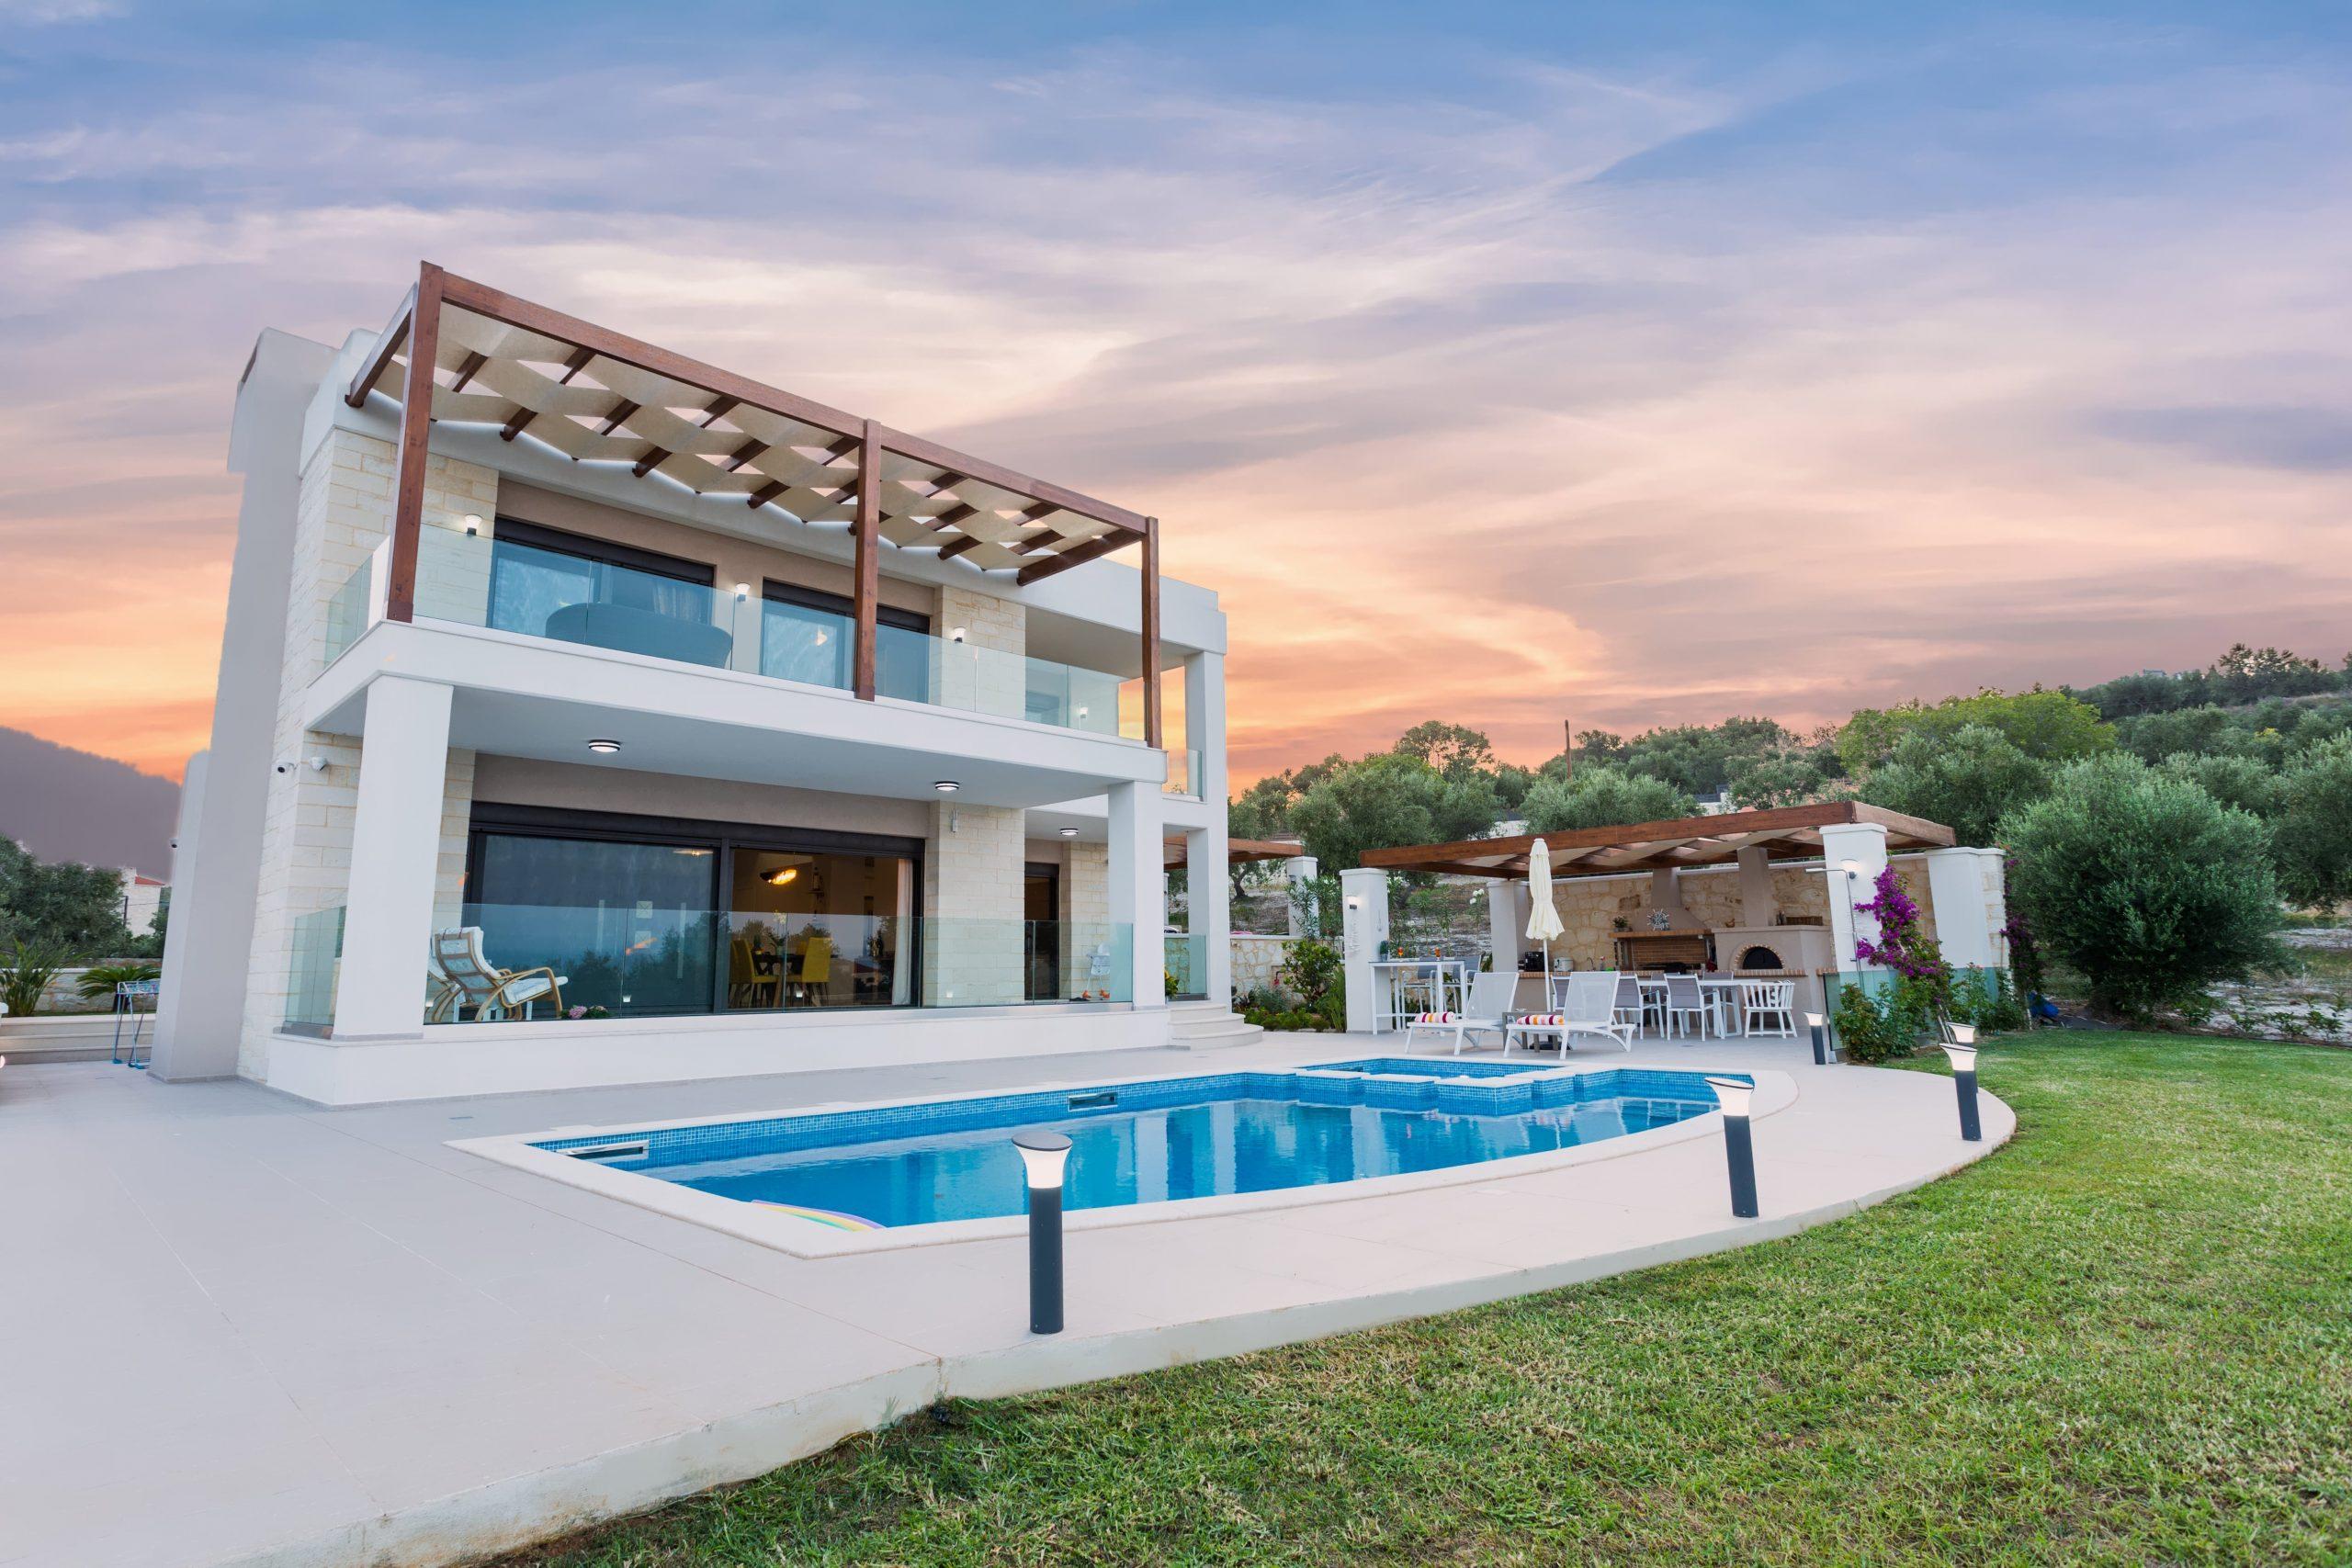 Villa in Crete- Luxury Villas and homes